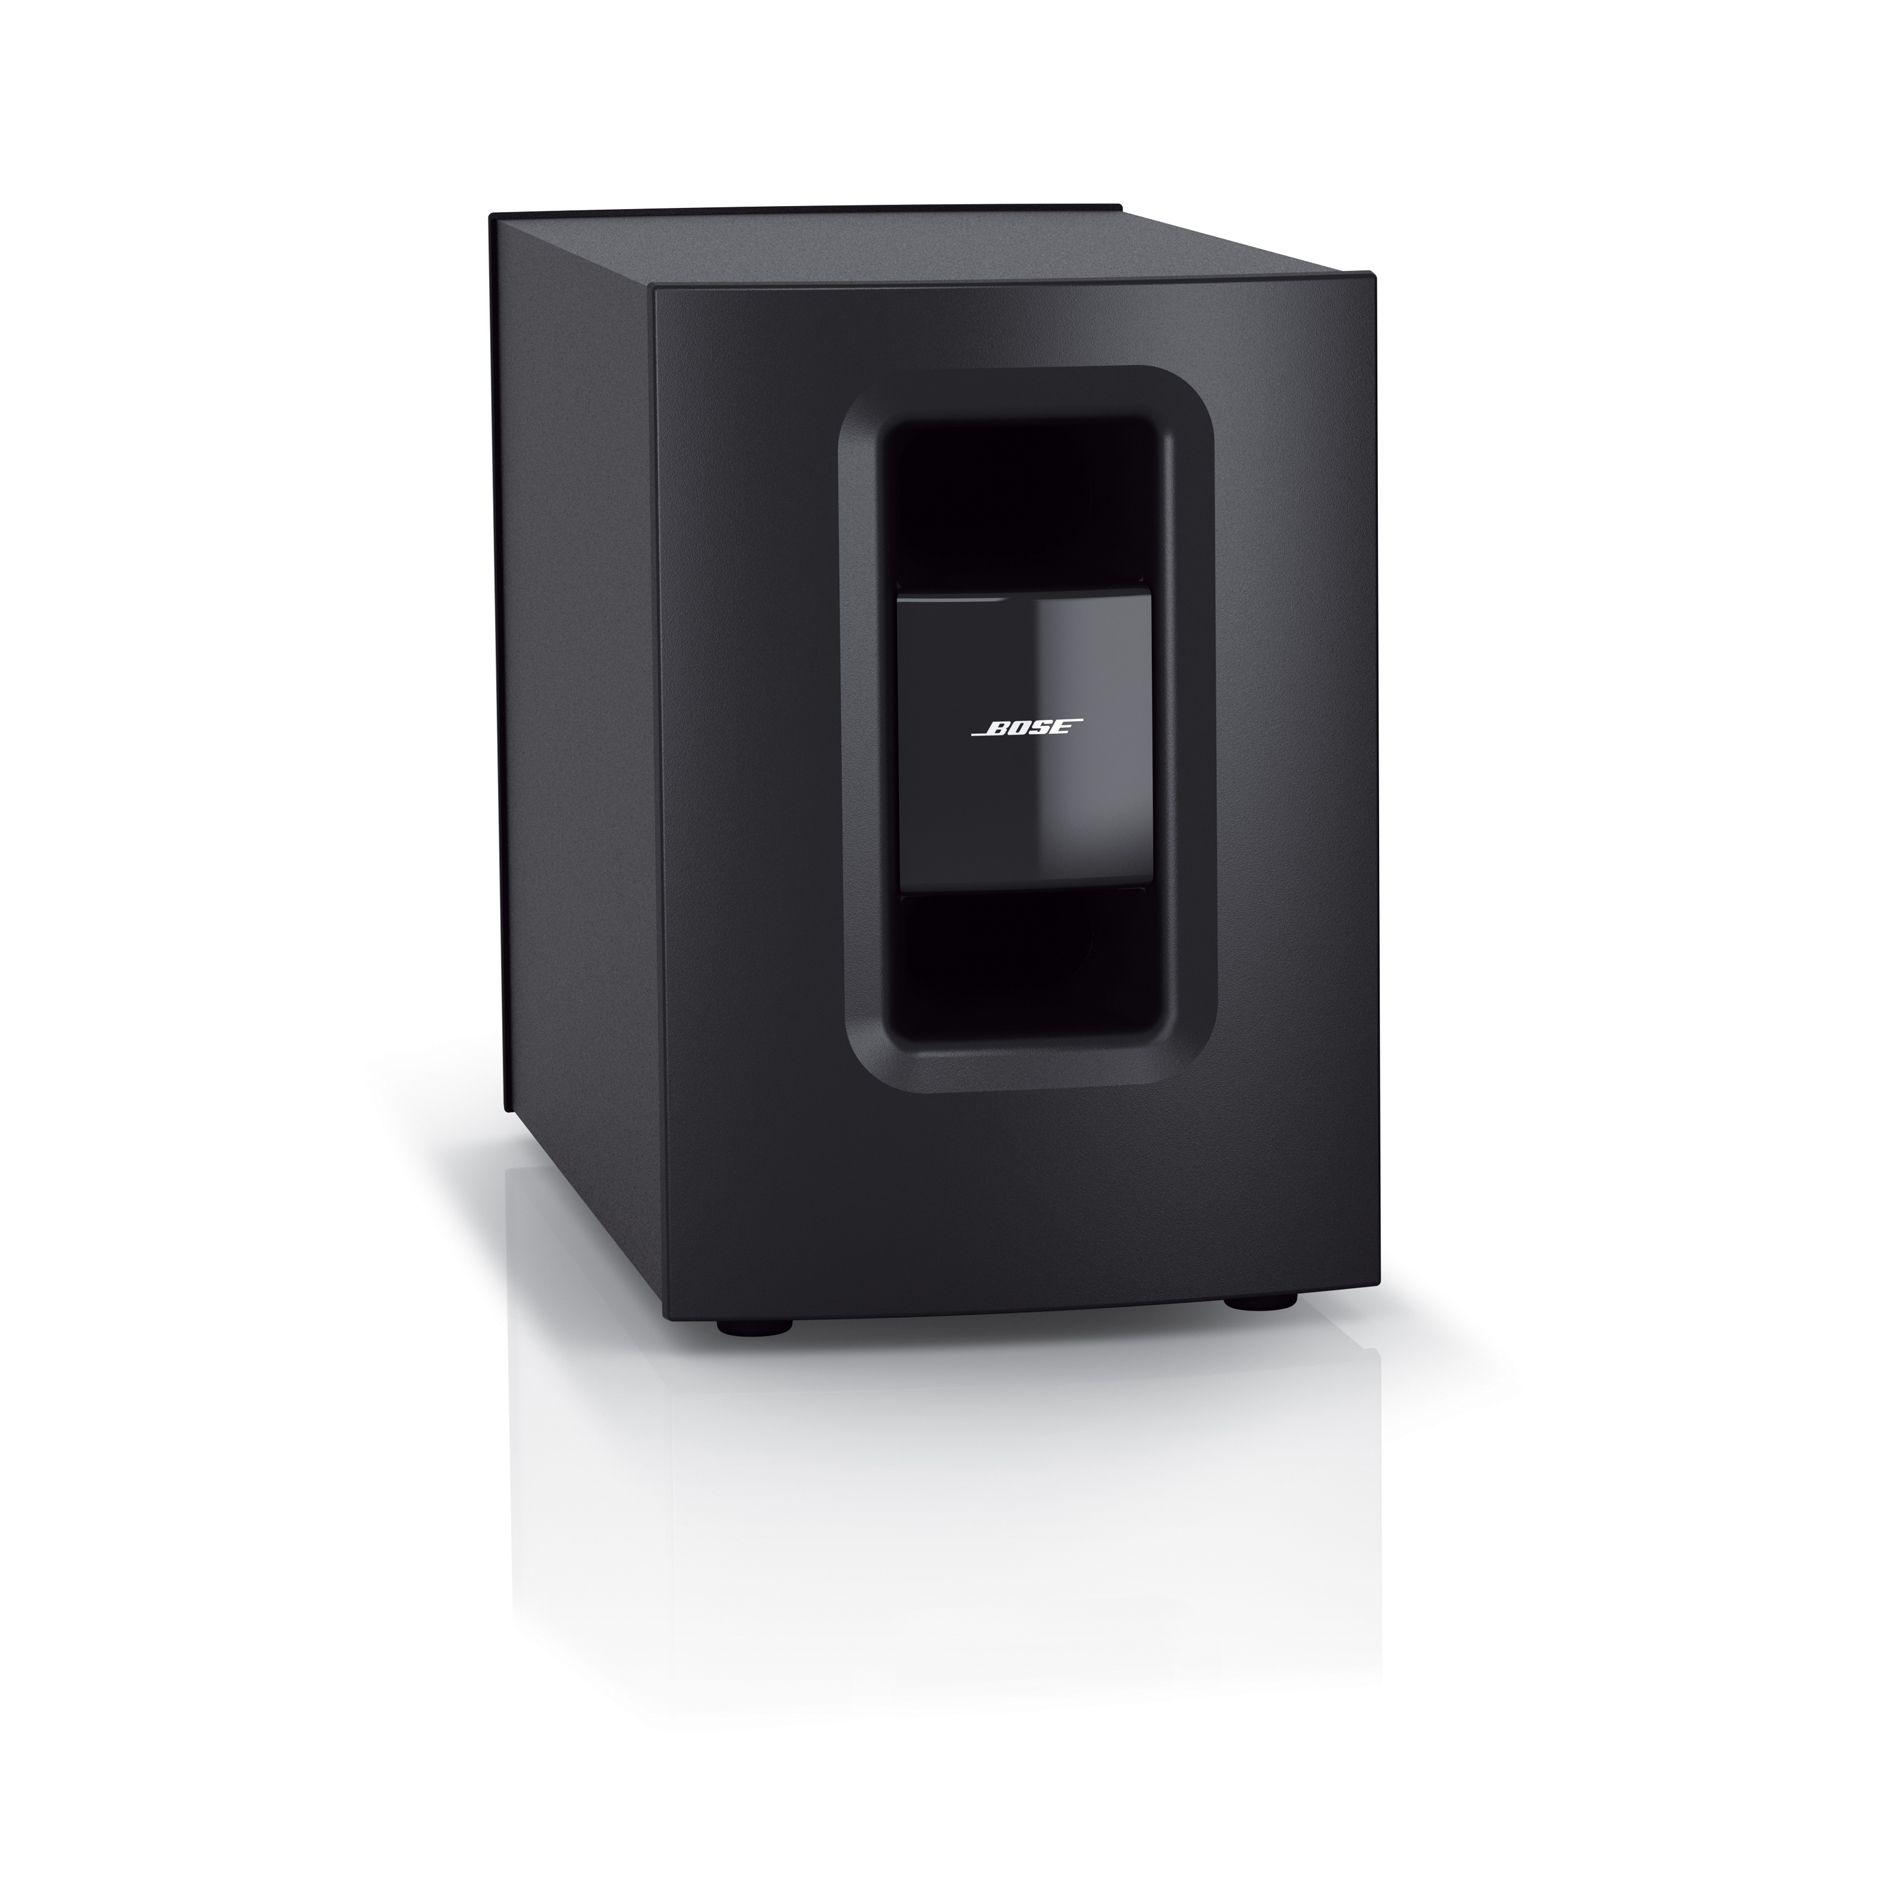 Bose CineMate® 1 SR Digital Home Theater Speaker System